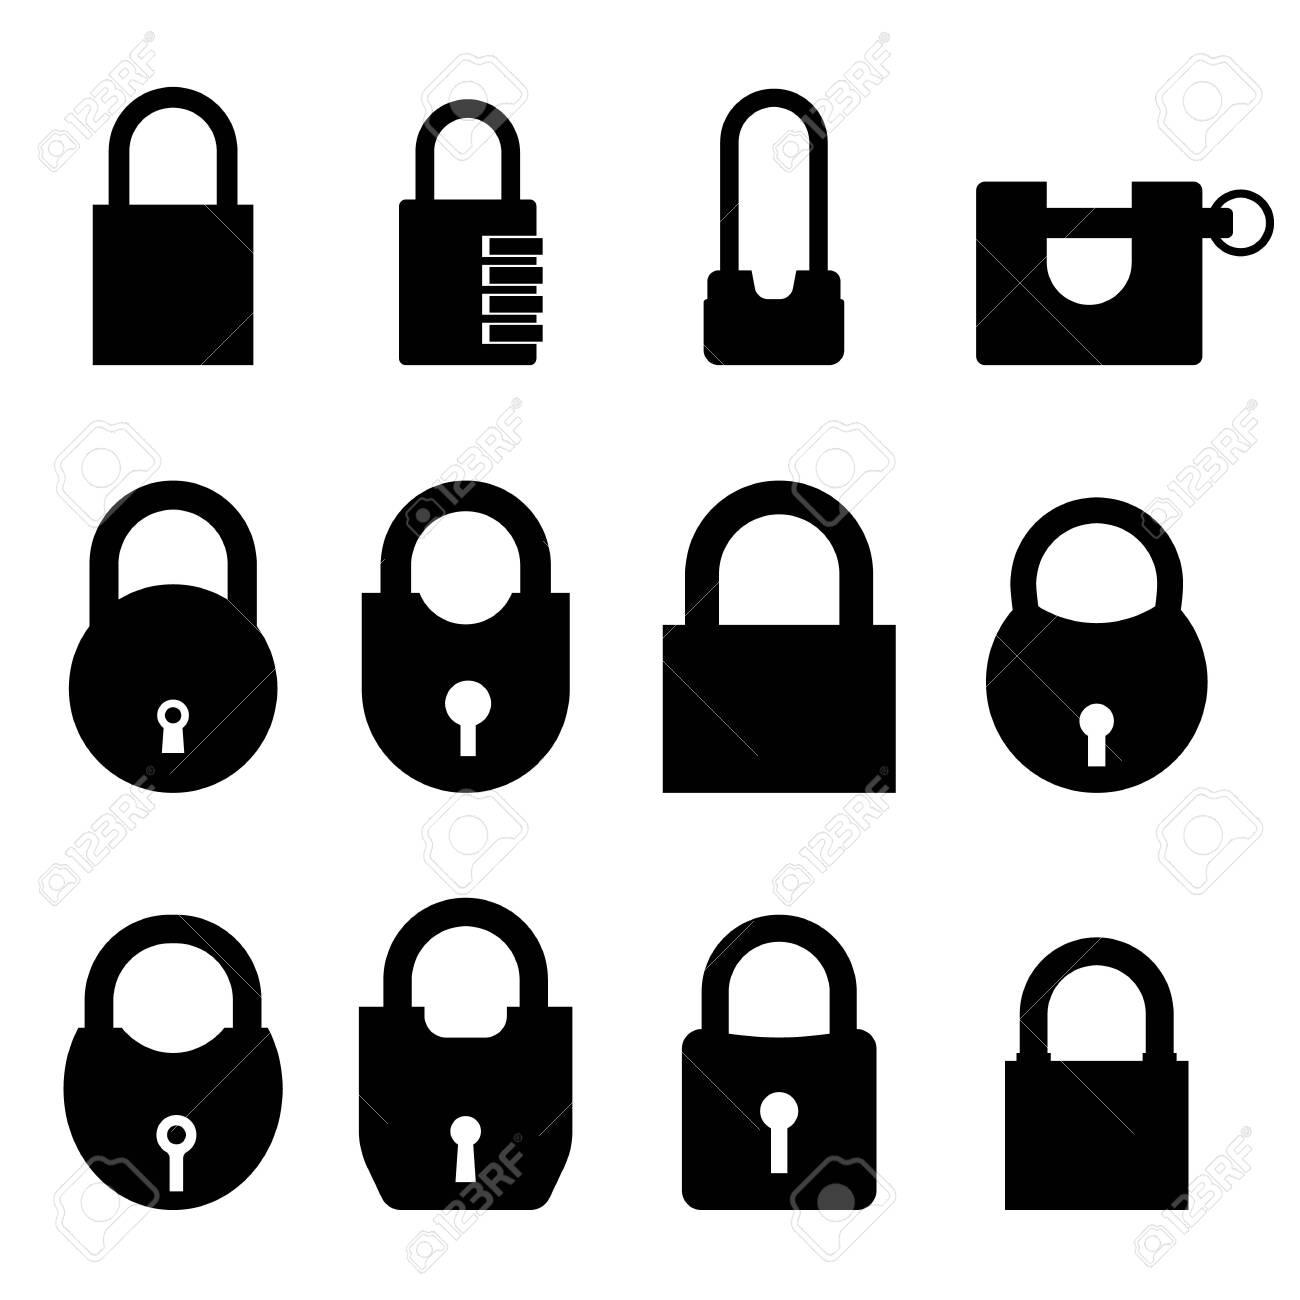 padlock vector illustration set on a white isolated background - 133863135